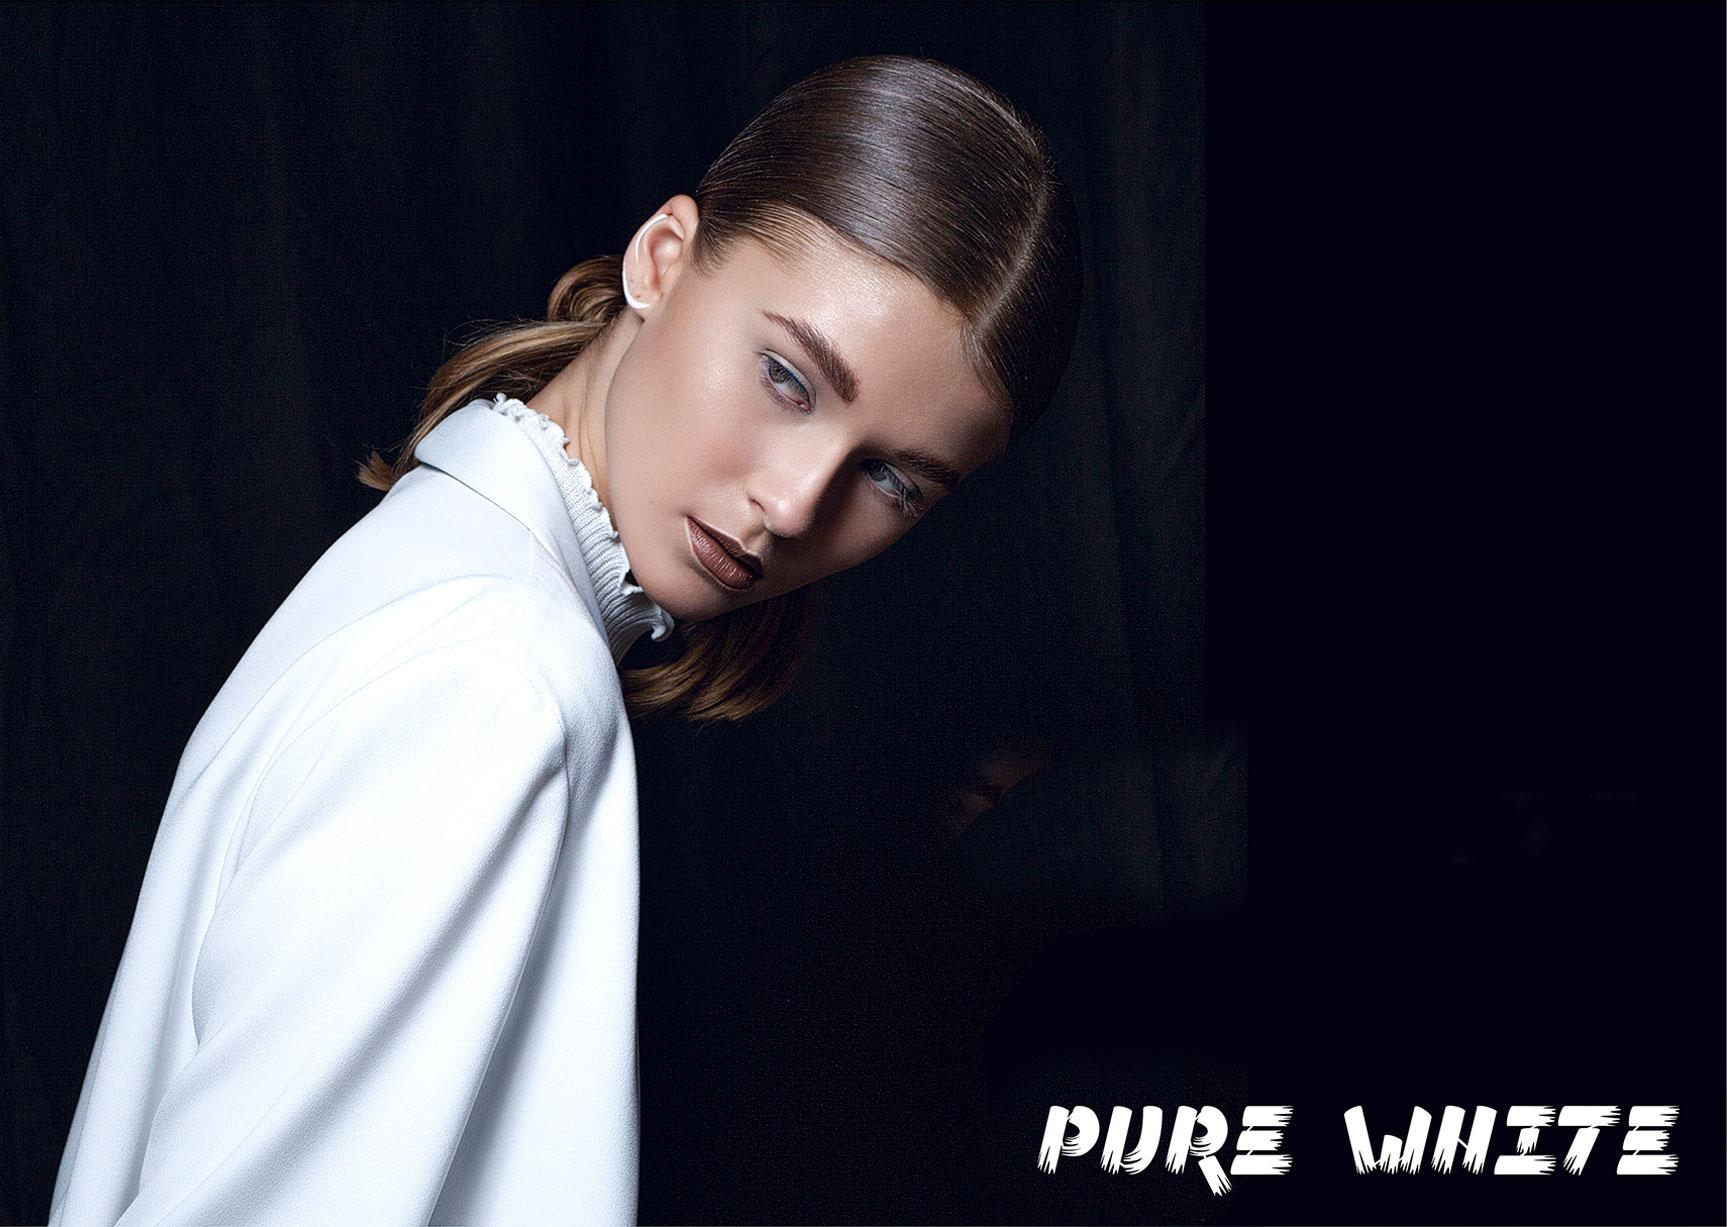 Pure white / Samantha Gietl by Veronica Formos / PolisArt Magazine may 2017